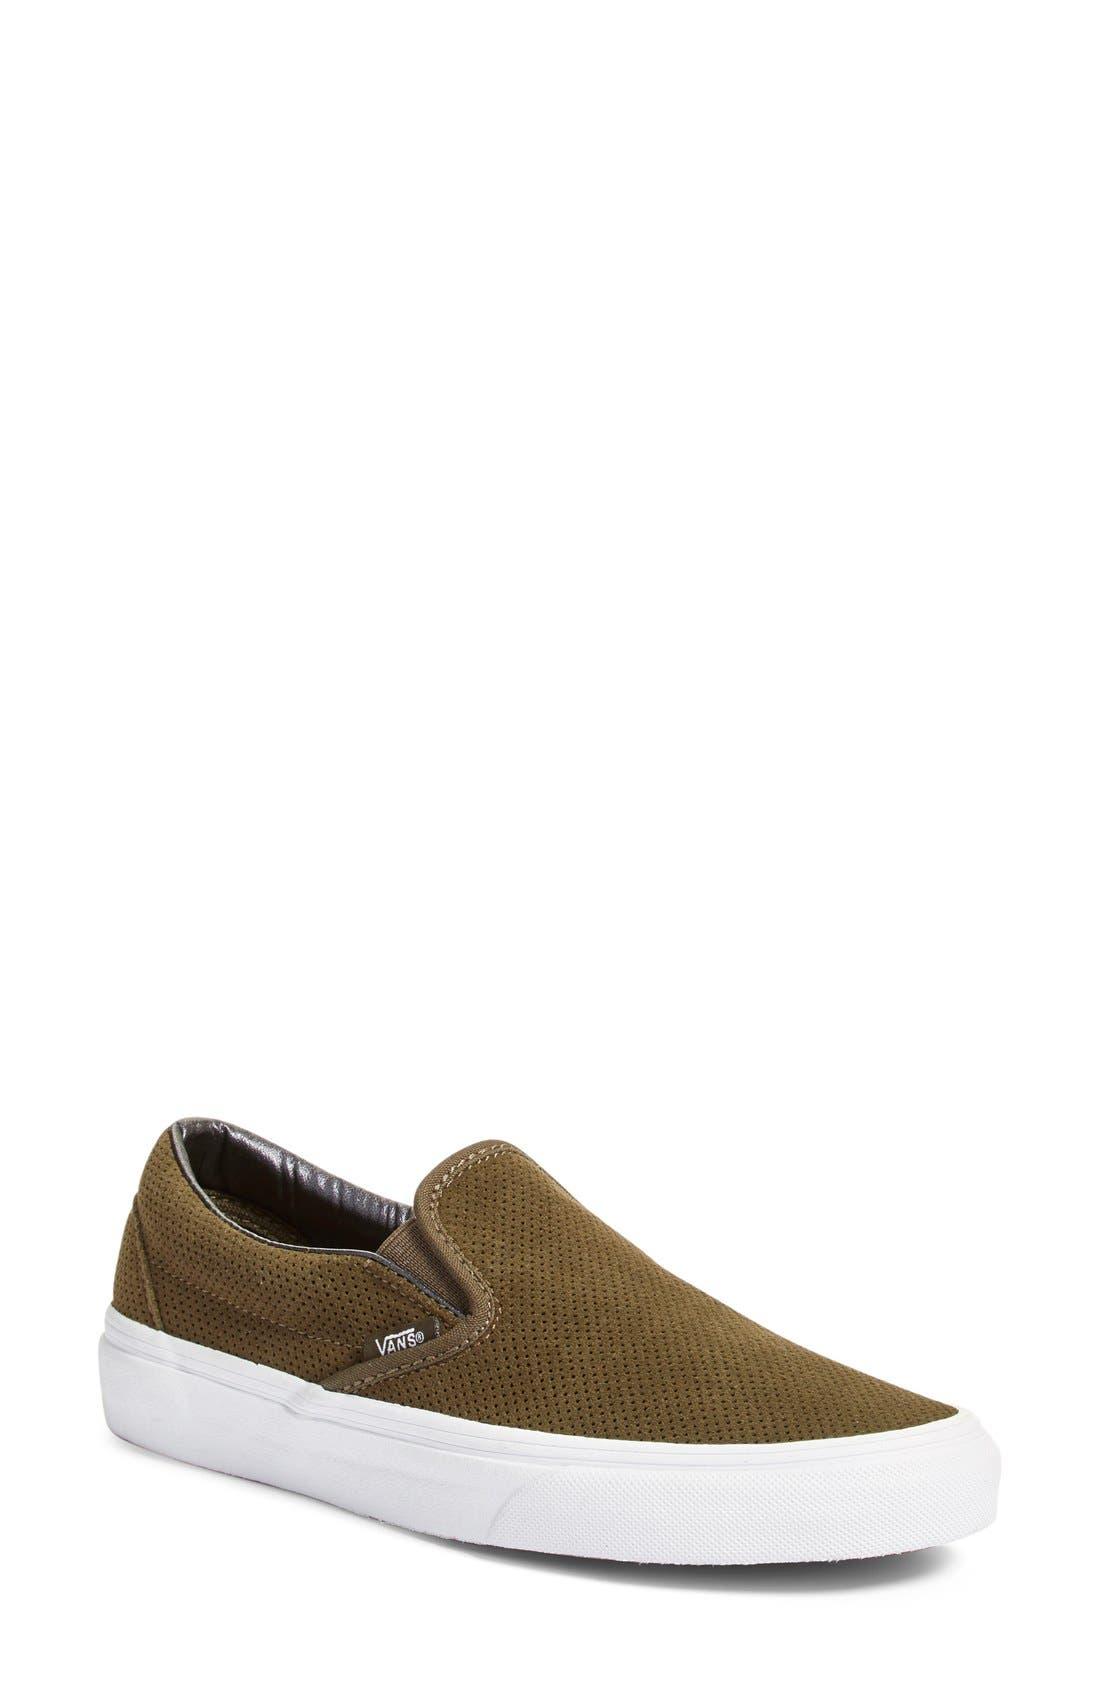 ,                             Classic Slip-On Sneaker,                             Main thumbnail 336, color,                             300